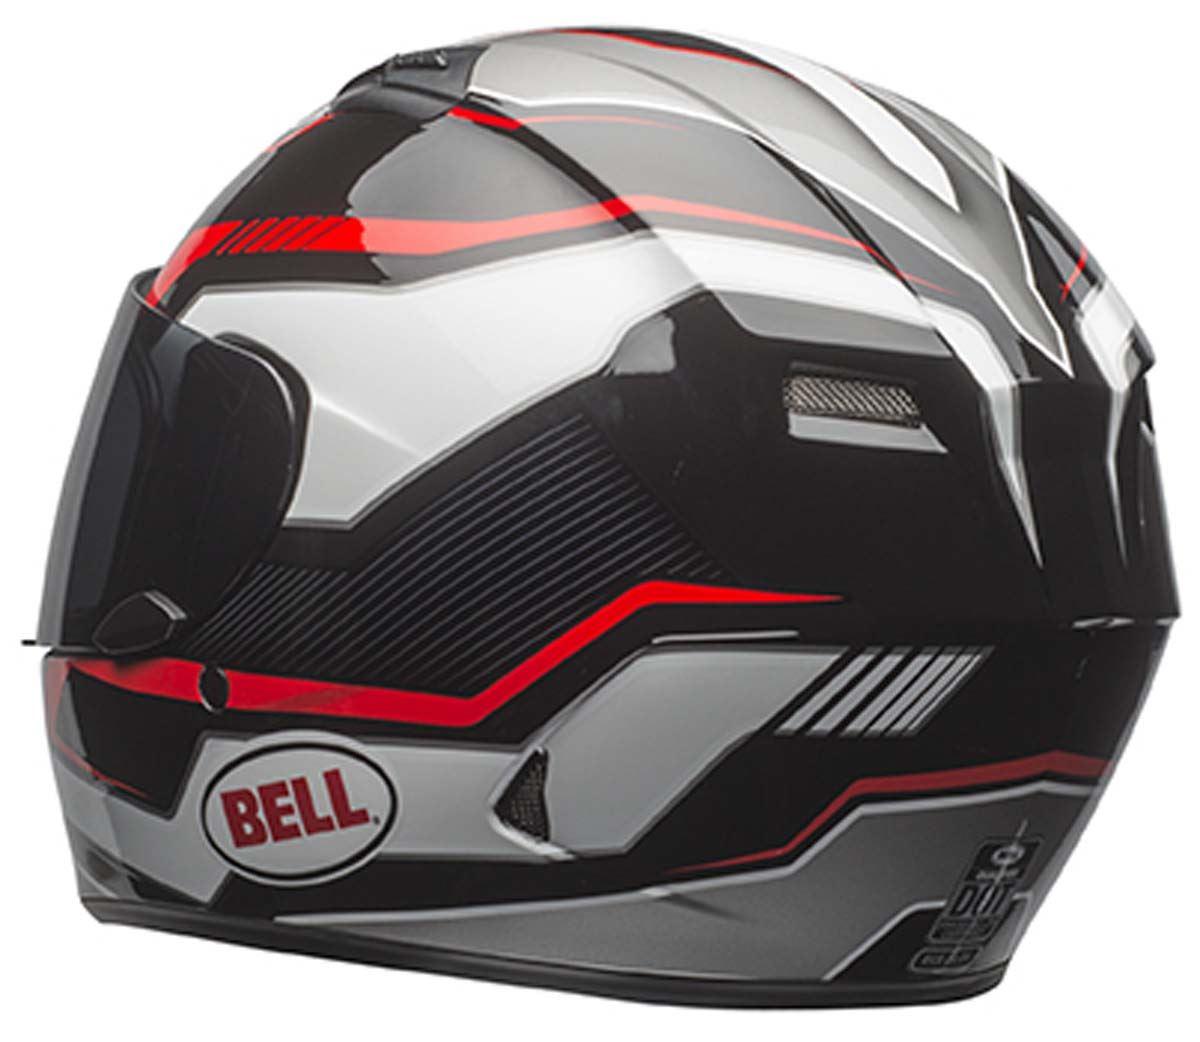 Bell-Qualifier-Helmet-Full-Face-Motorcycle-Clear-Shield-DOT-XS-3XL miniature 19